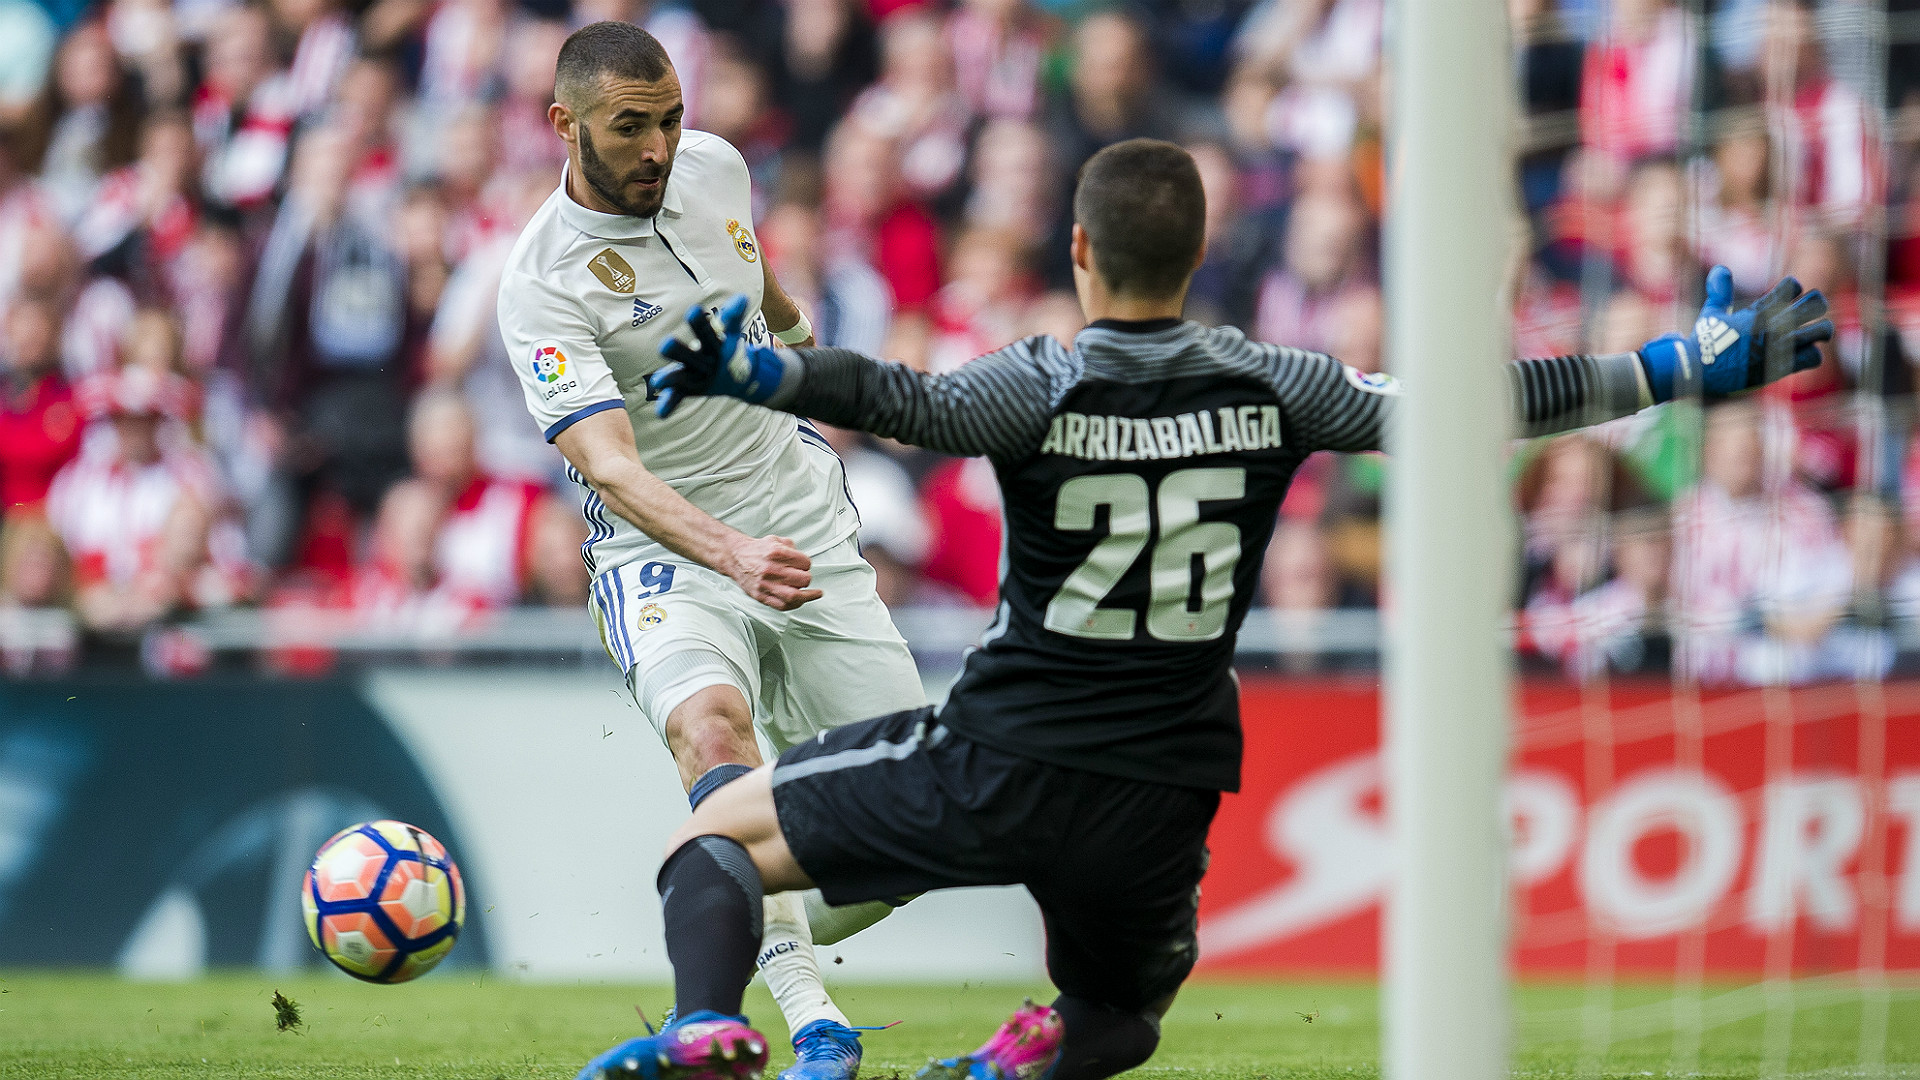 Karim Benzema Kepa Arrizabalaga Athletic Bilbao Real Madrid